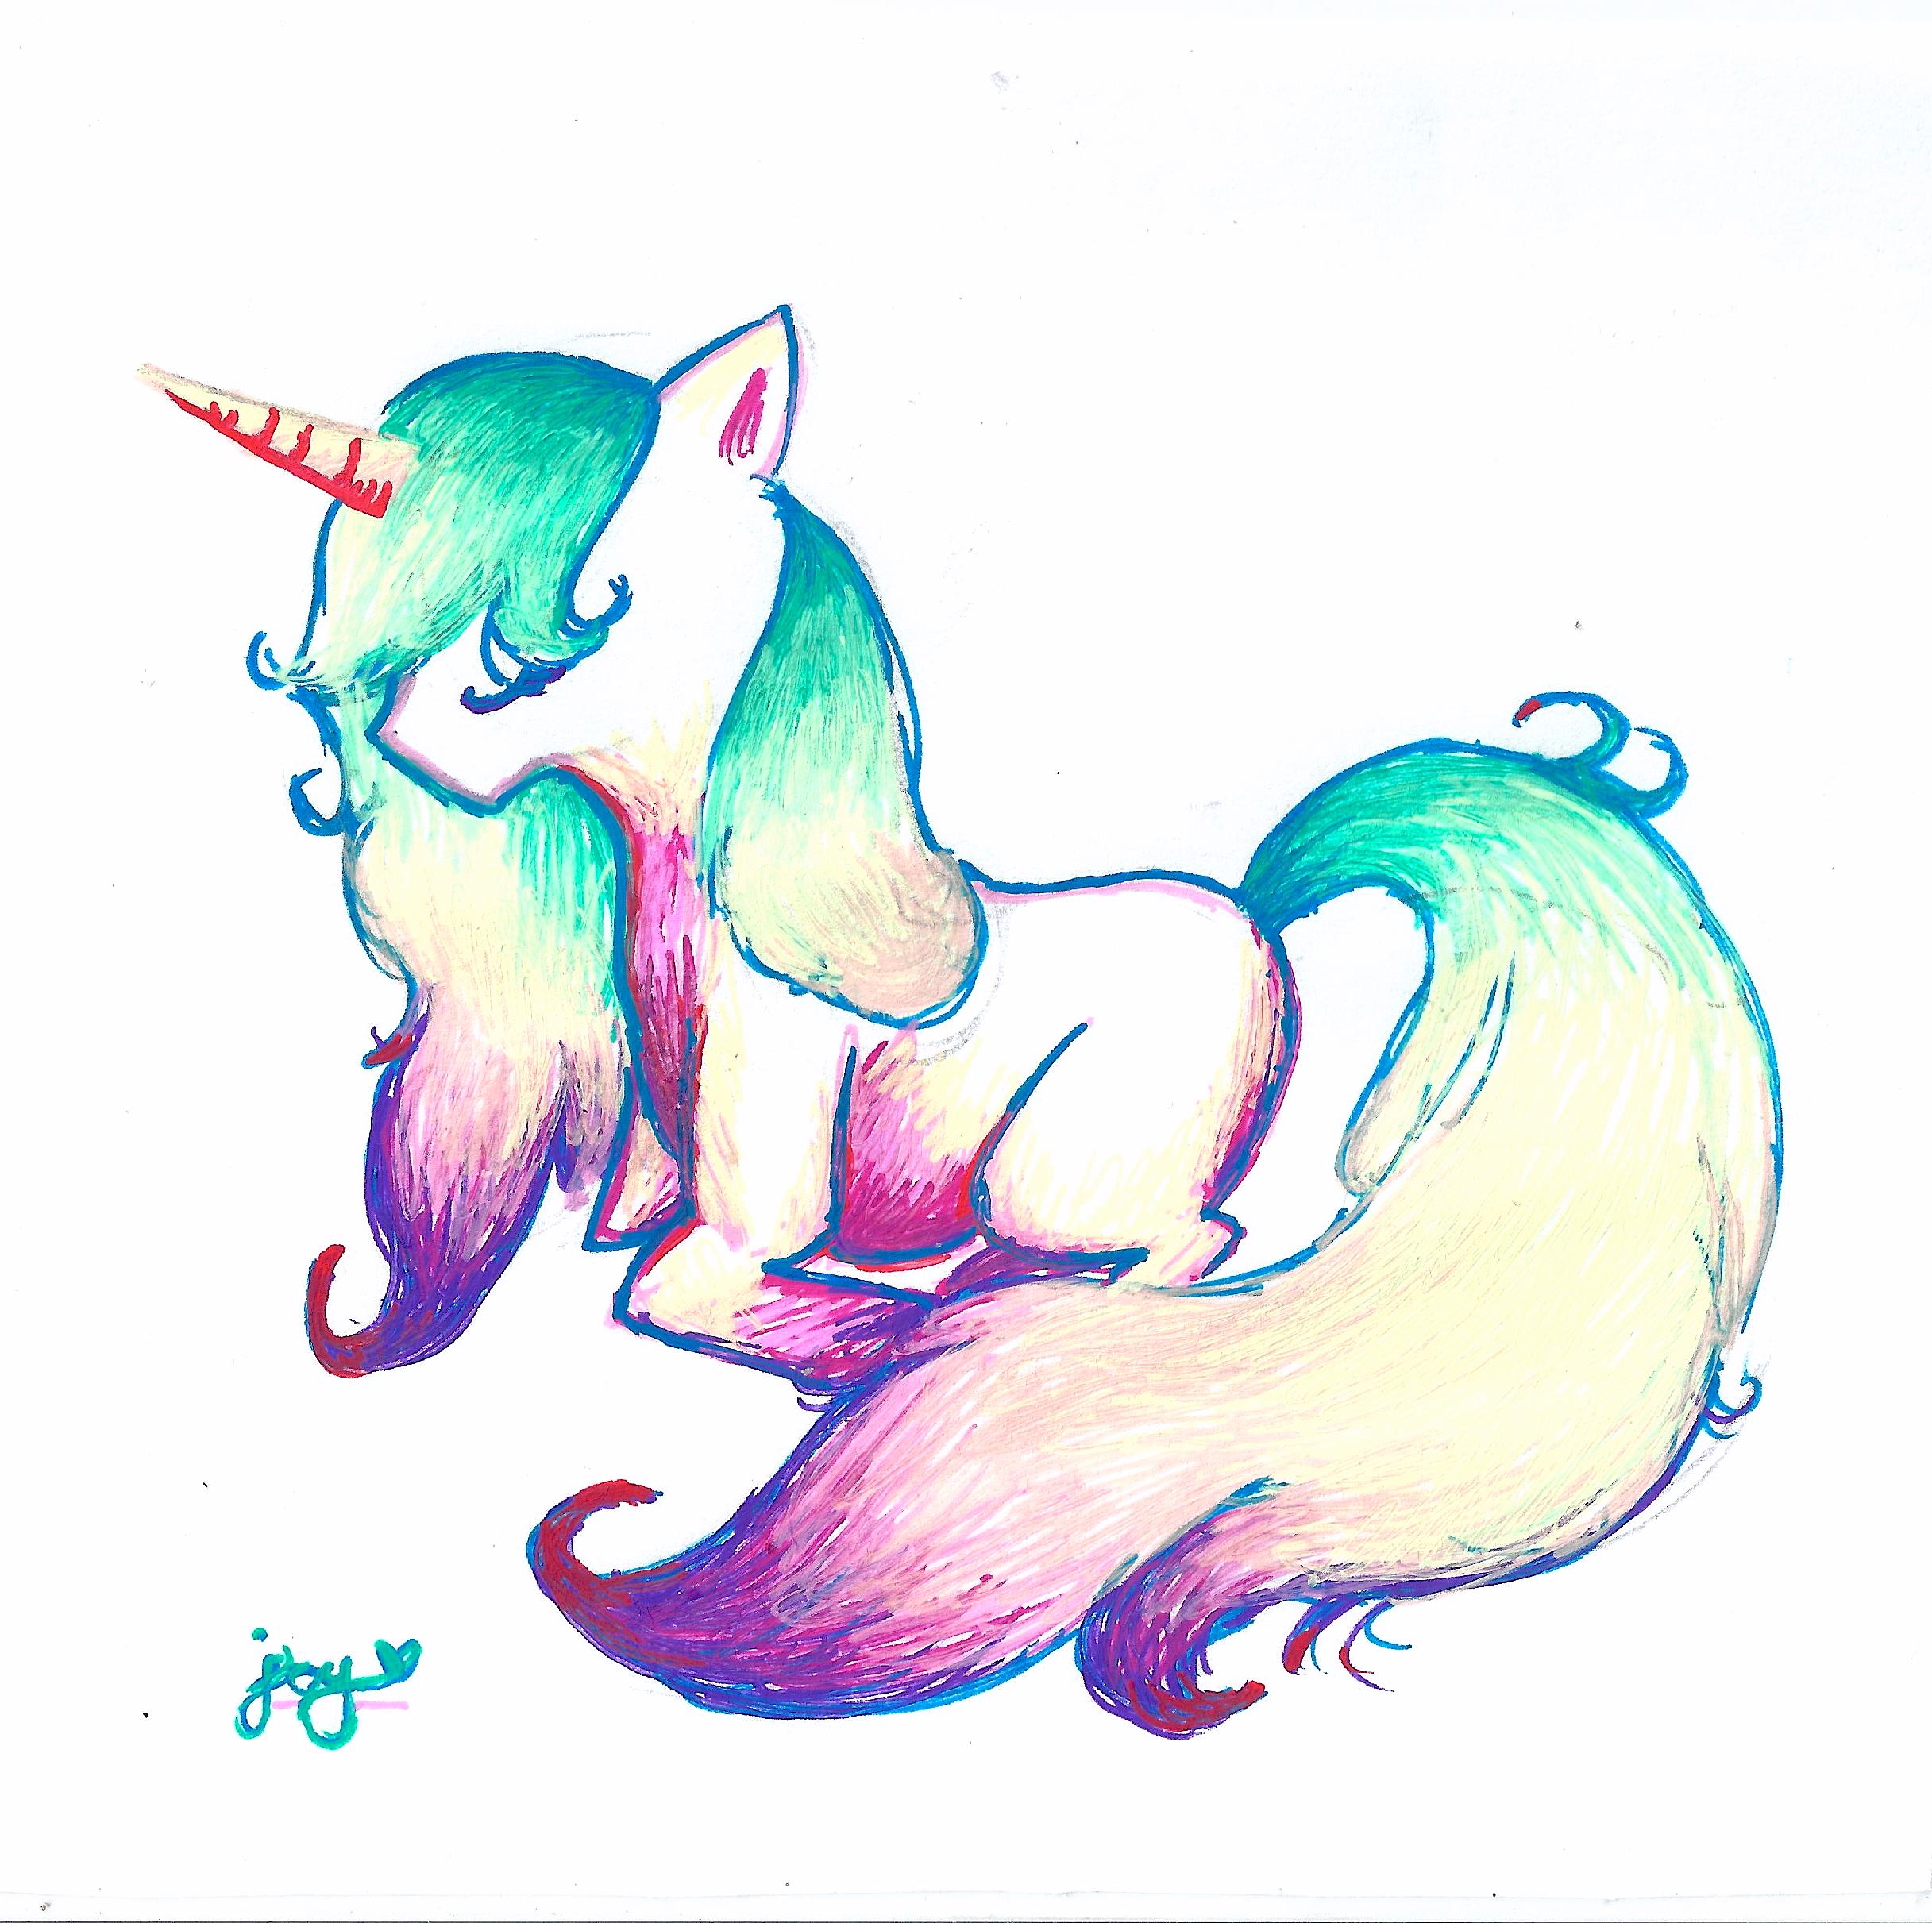 Uncategorized Drawing Of Unicorn unicorn drawing by yunixis on deviantart yunixis